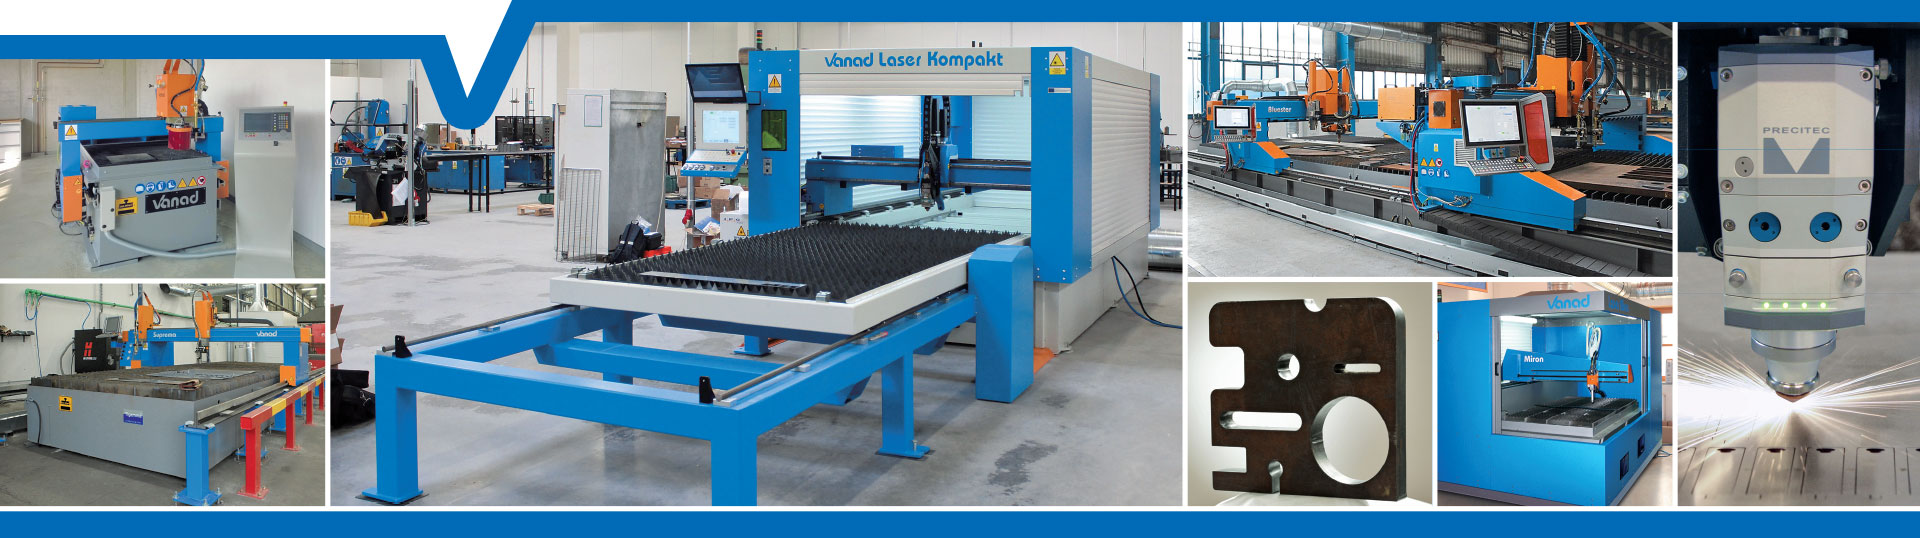 Serwis maszyn CNC